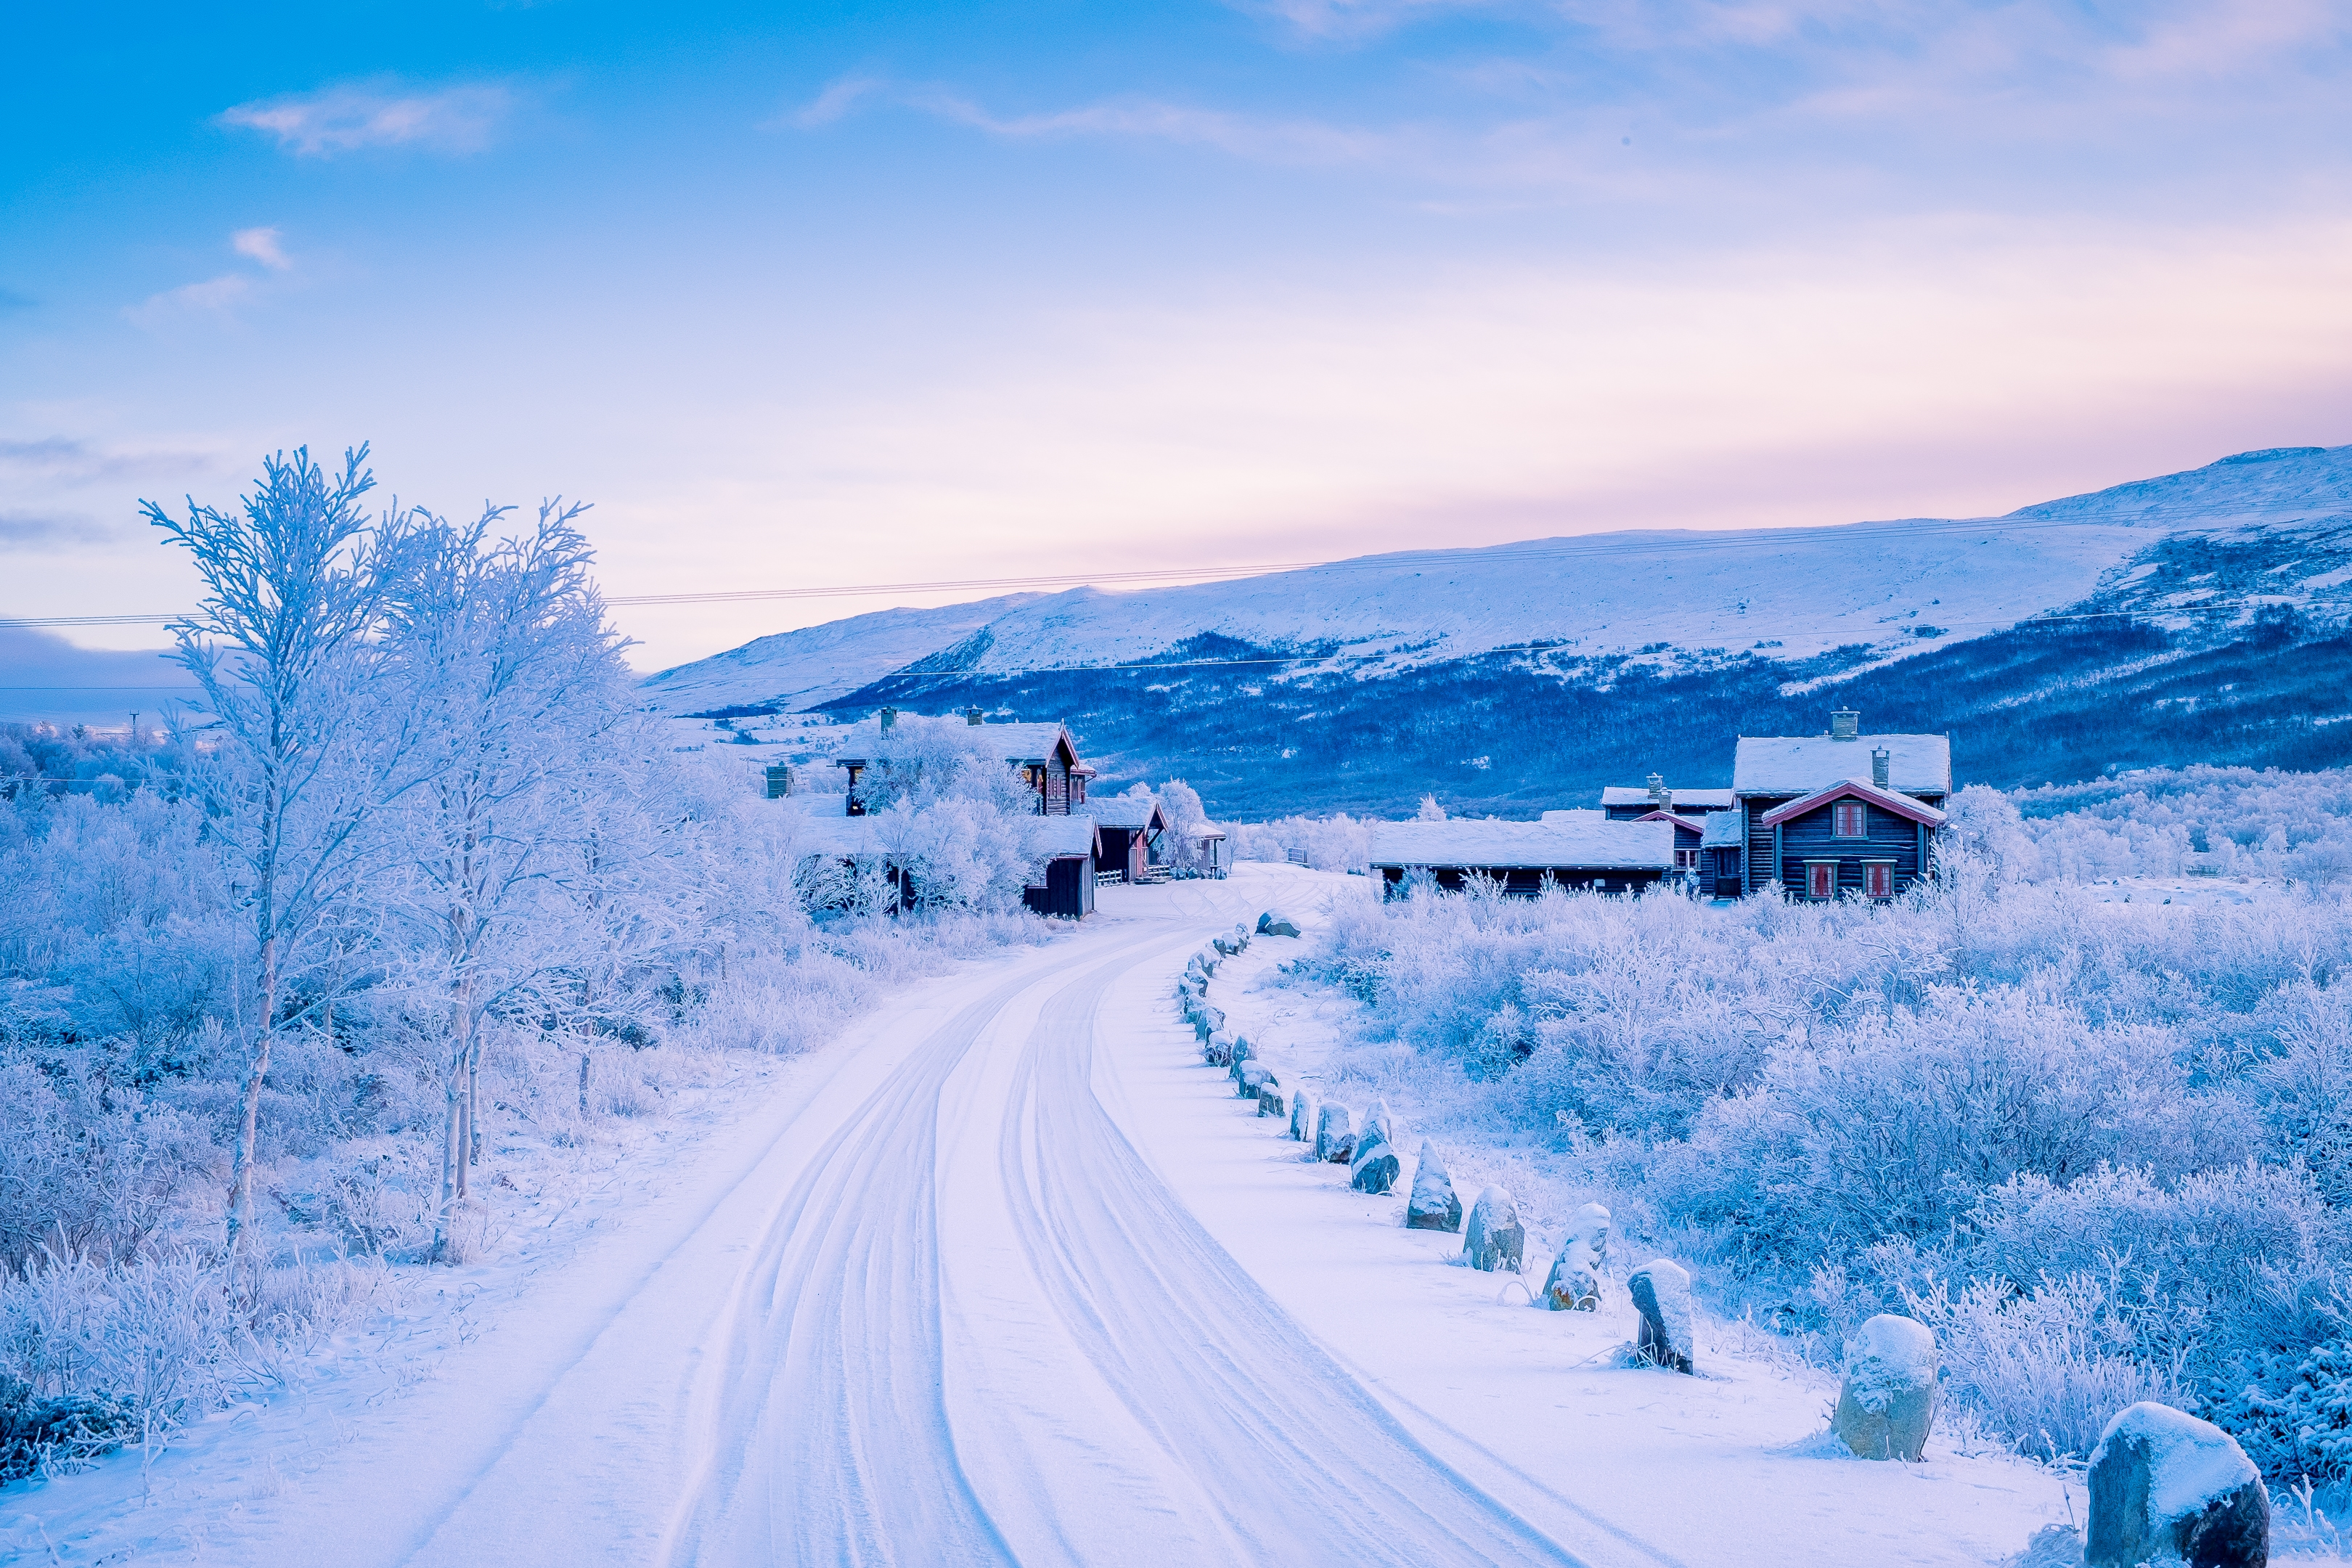 зима деревня снег winter the village snow скачать